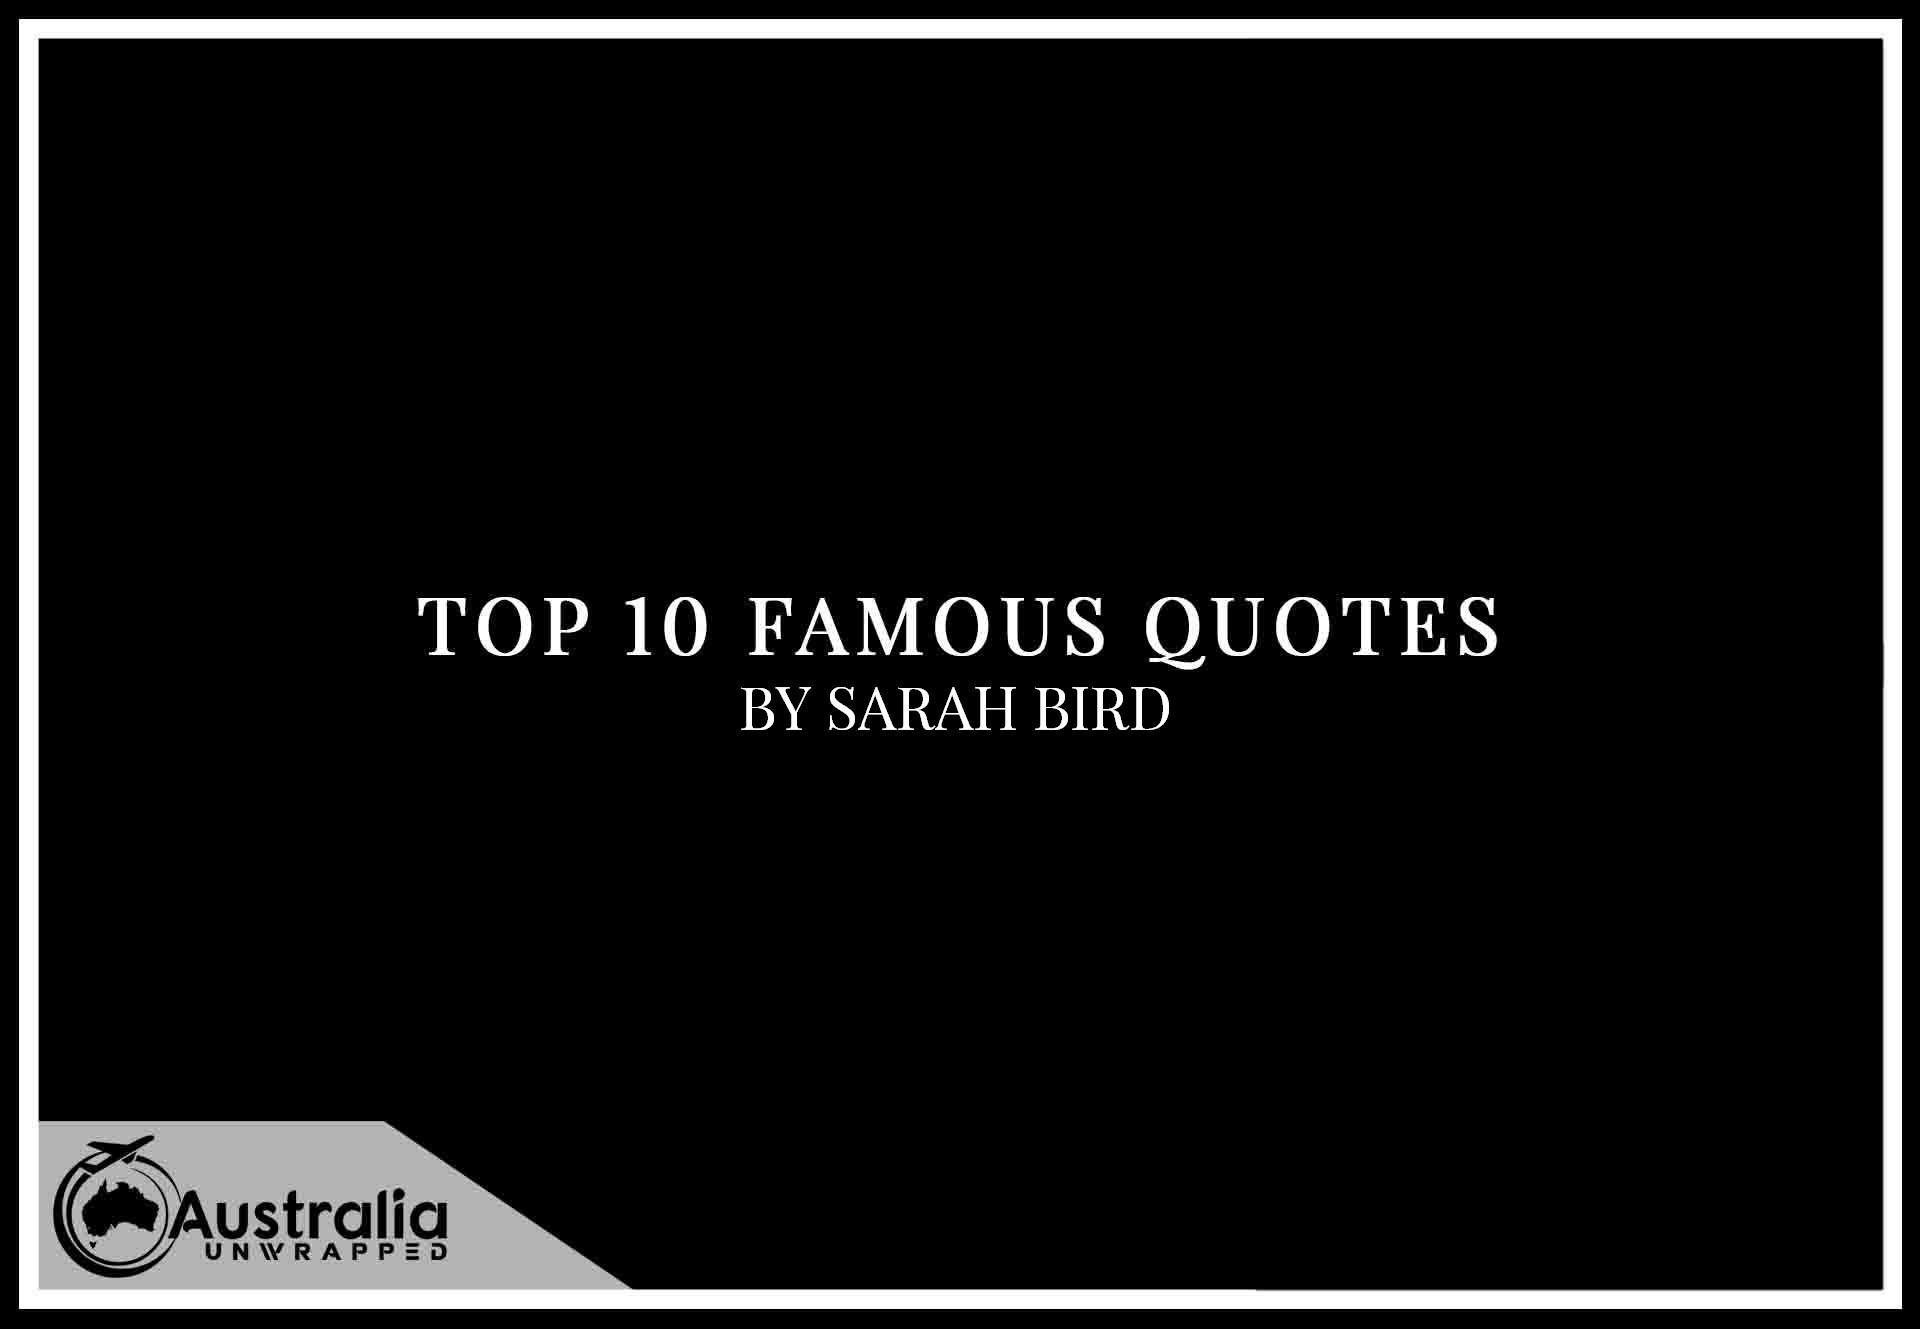 Top 10 Famous Quotes by Author Sarah Bird